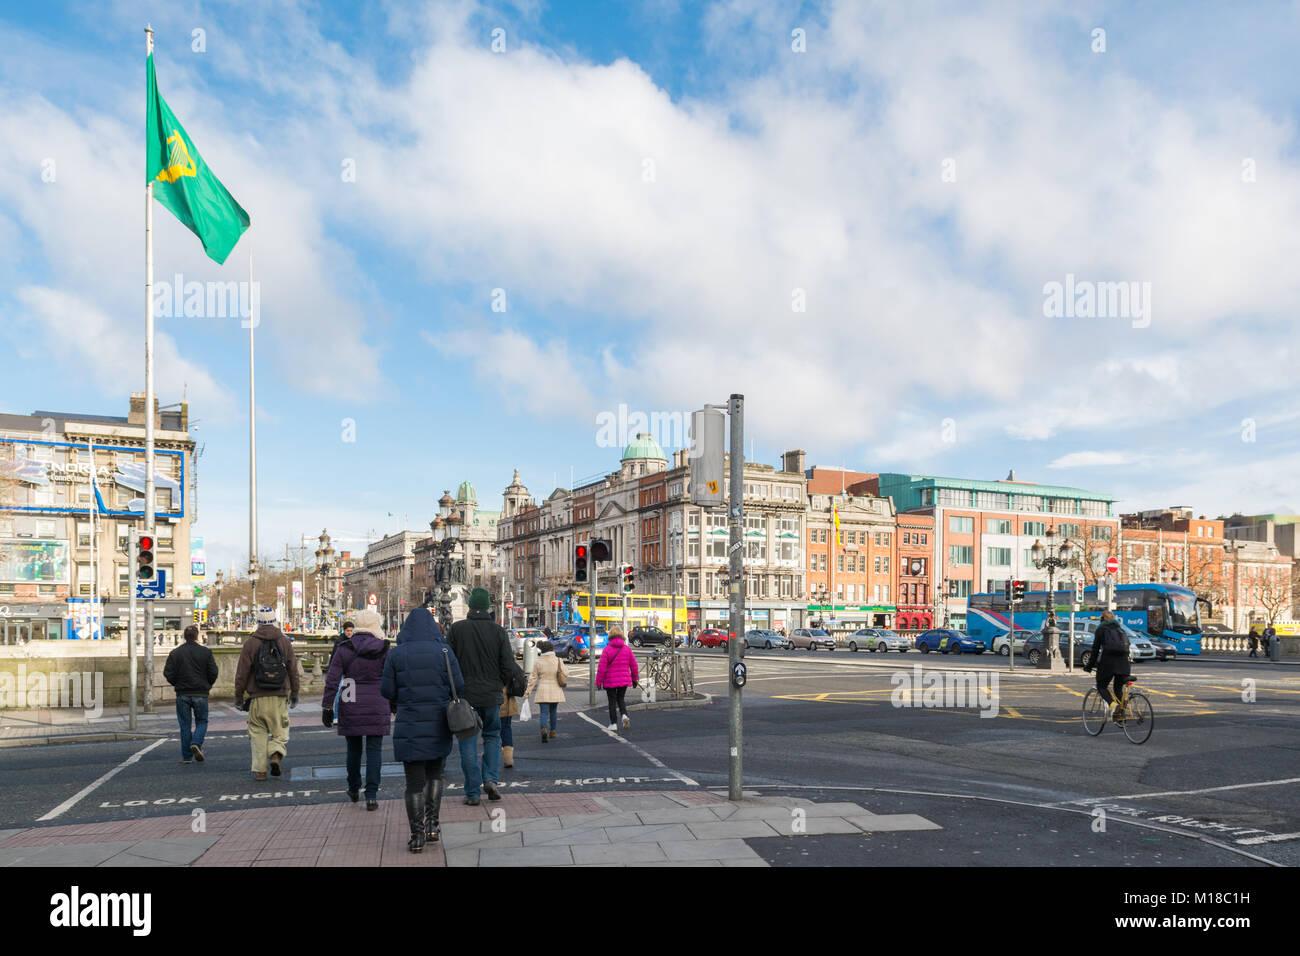 pedestrians crossing the road at O'Connell Bridge, Dublin facing towards O'Connell Street, Dublin, Ireland, - Stock Image